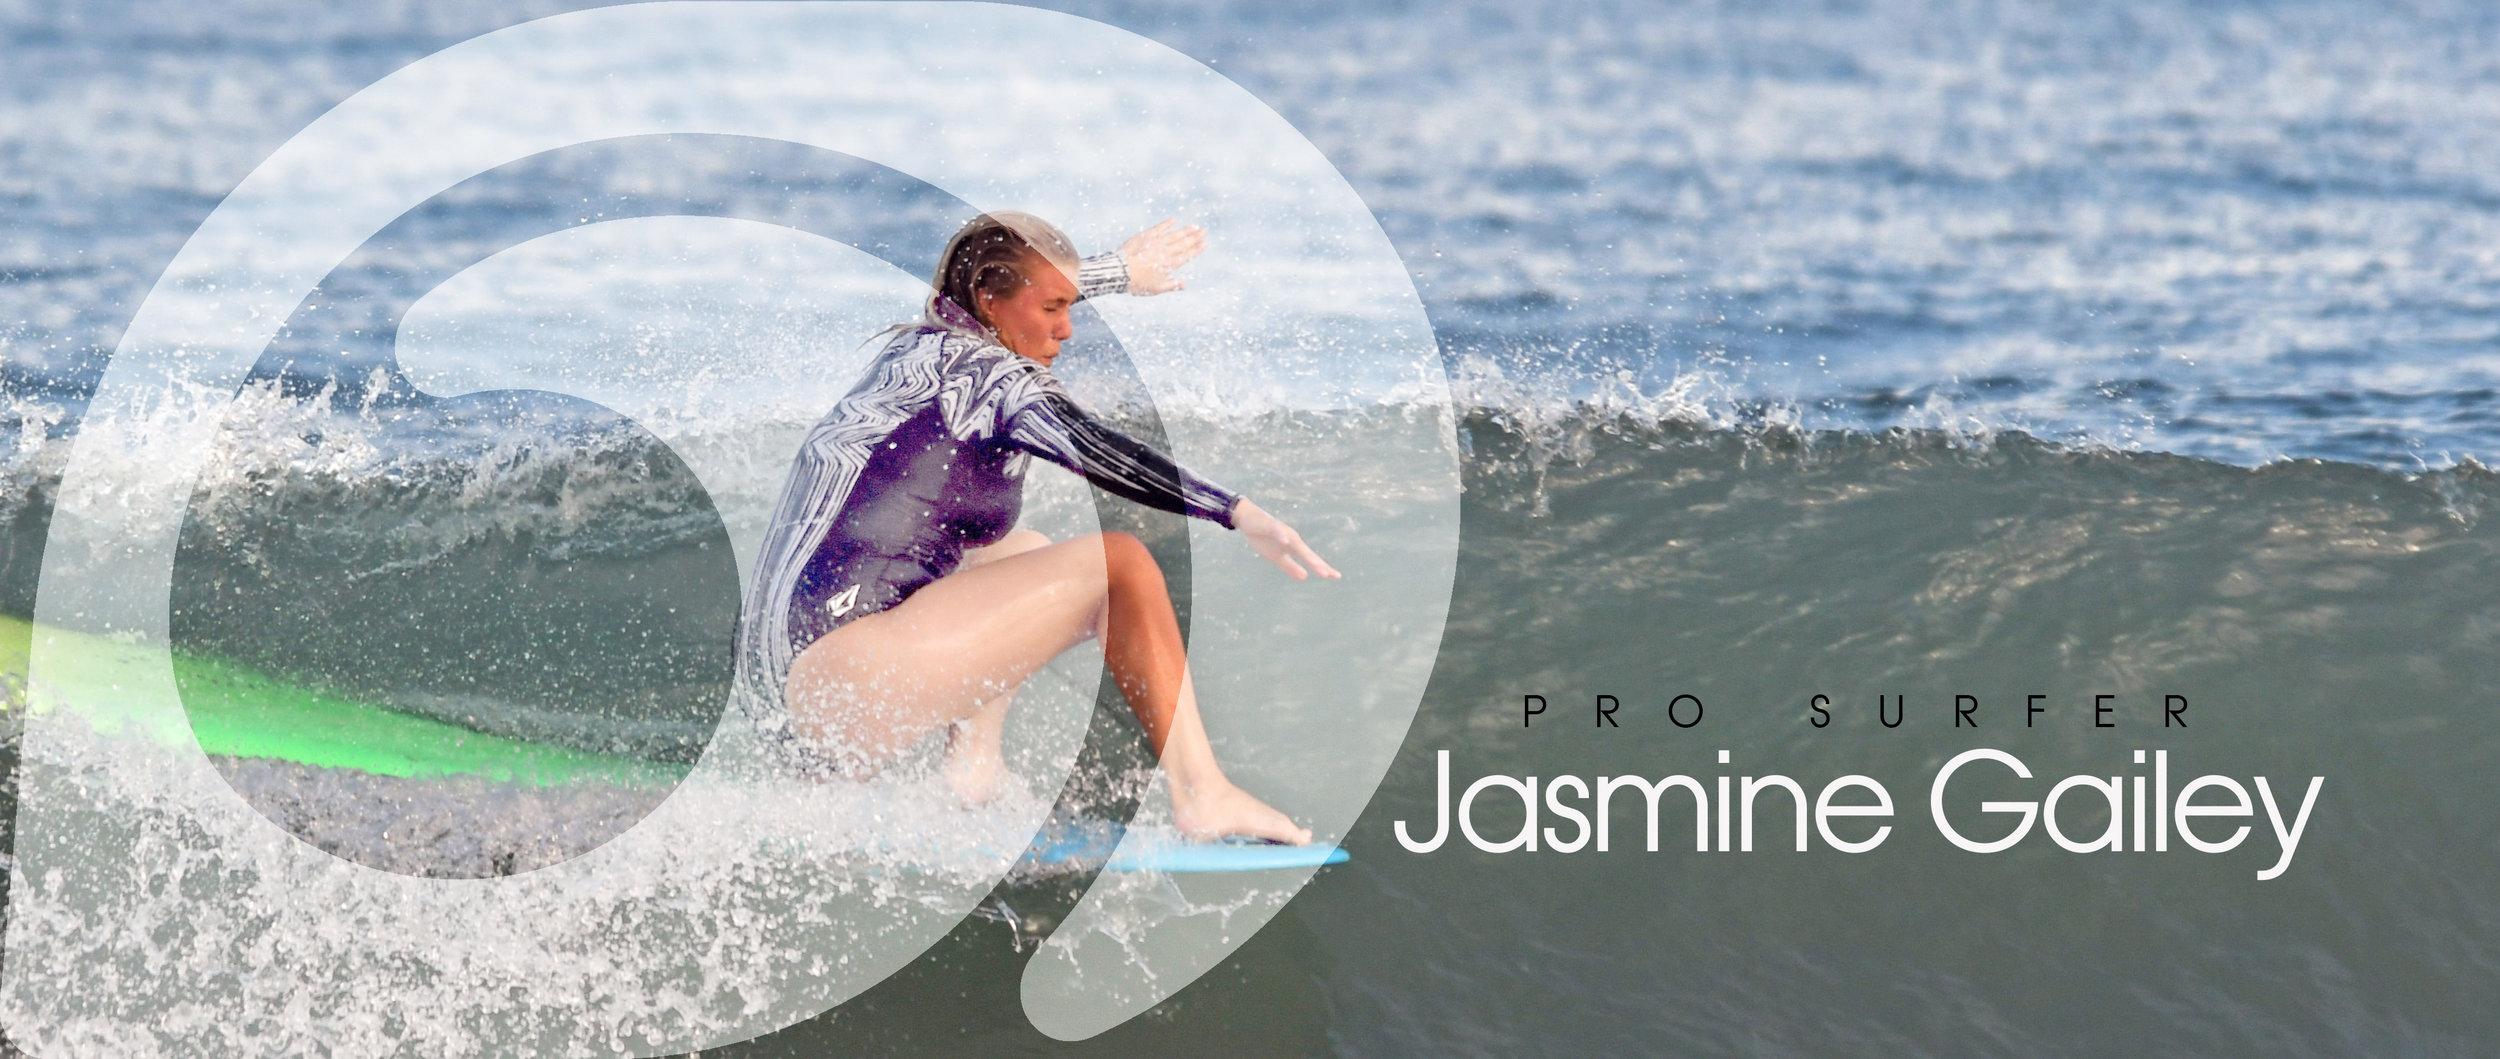 JASMINE 1.jpg